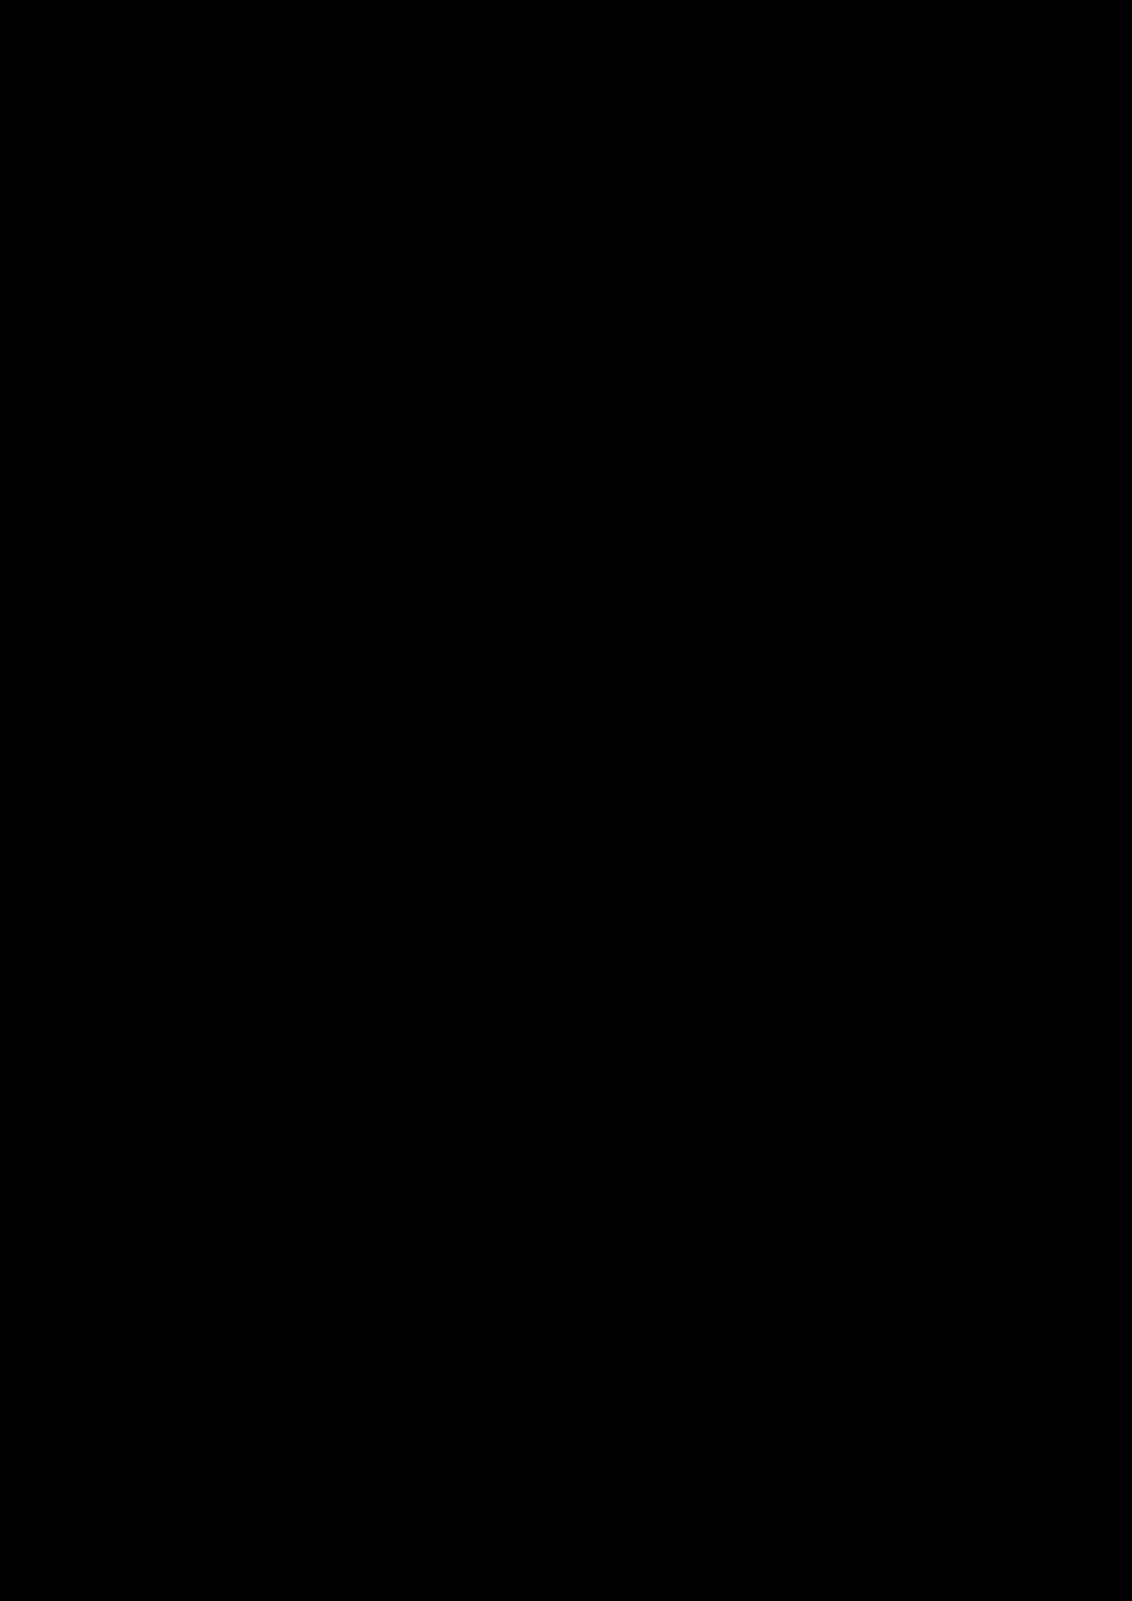 Belyiy sokol slide, Image 73